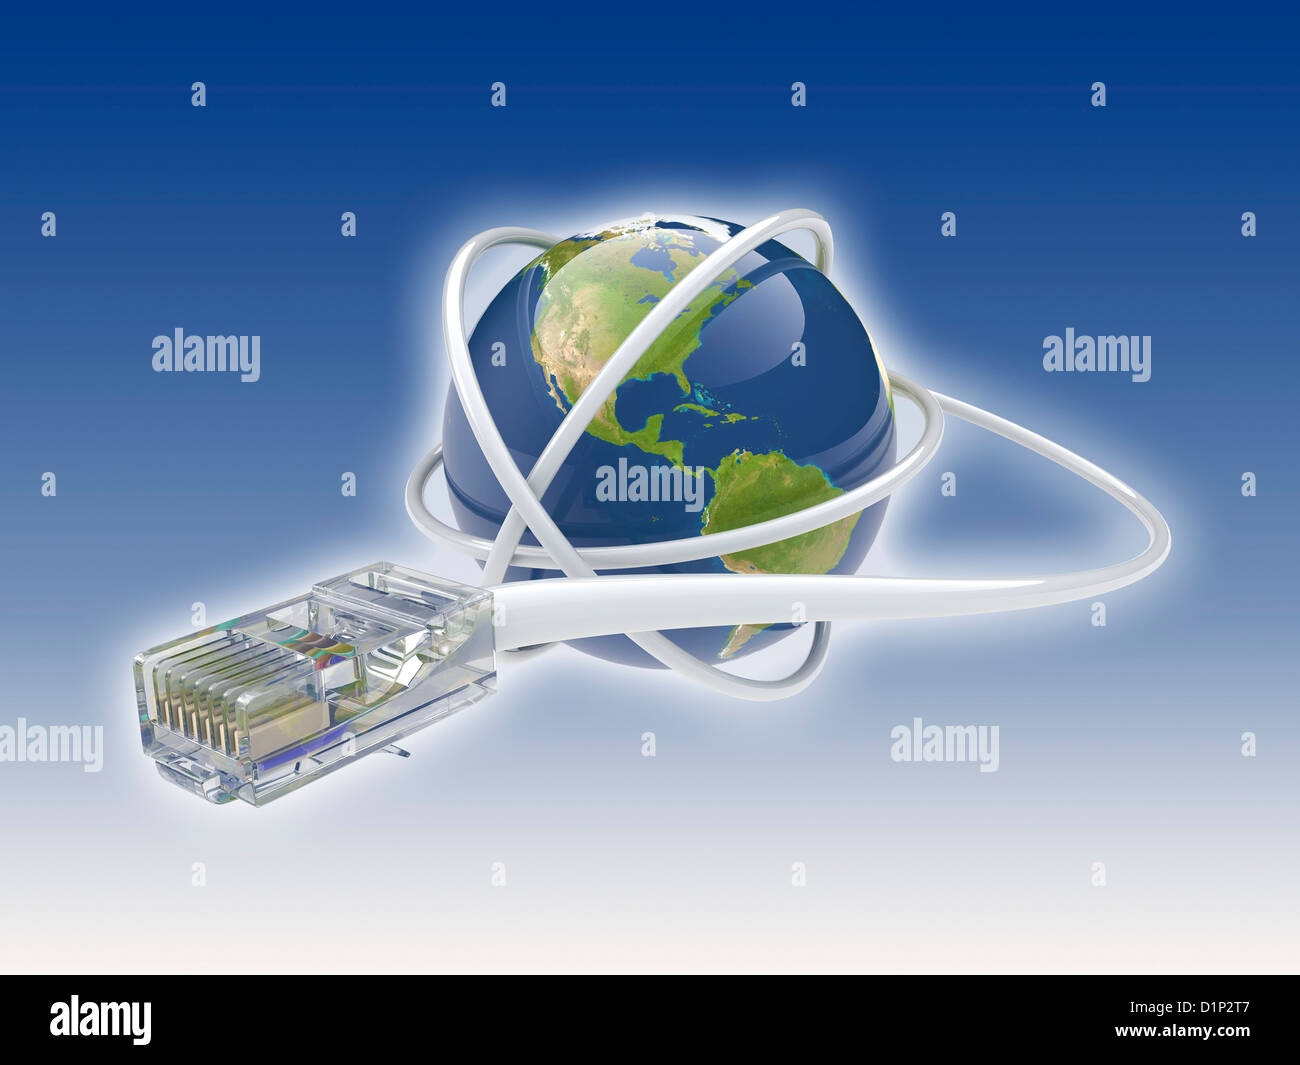 World wide web, conceptual image - Stock Image